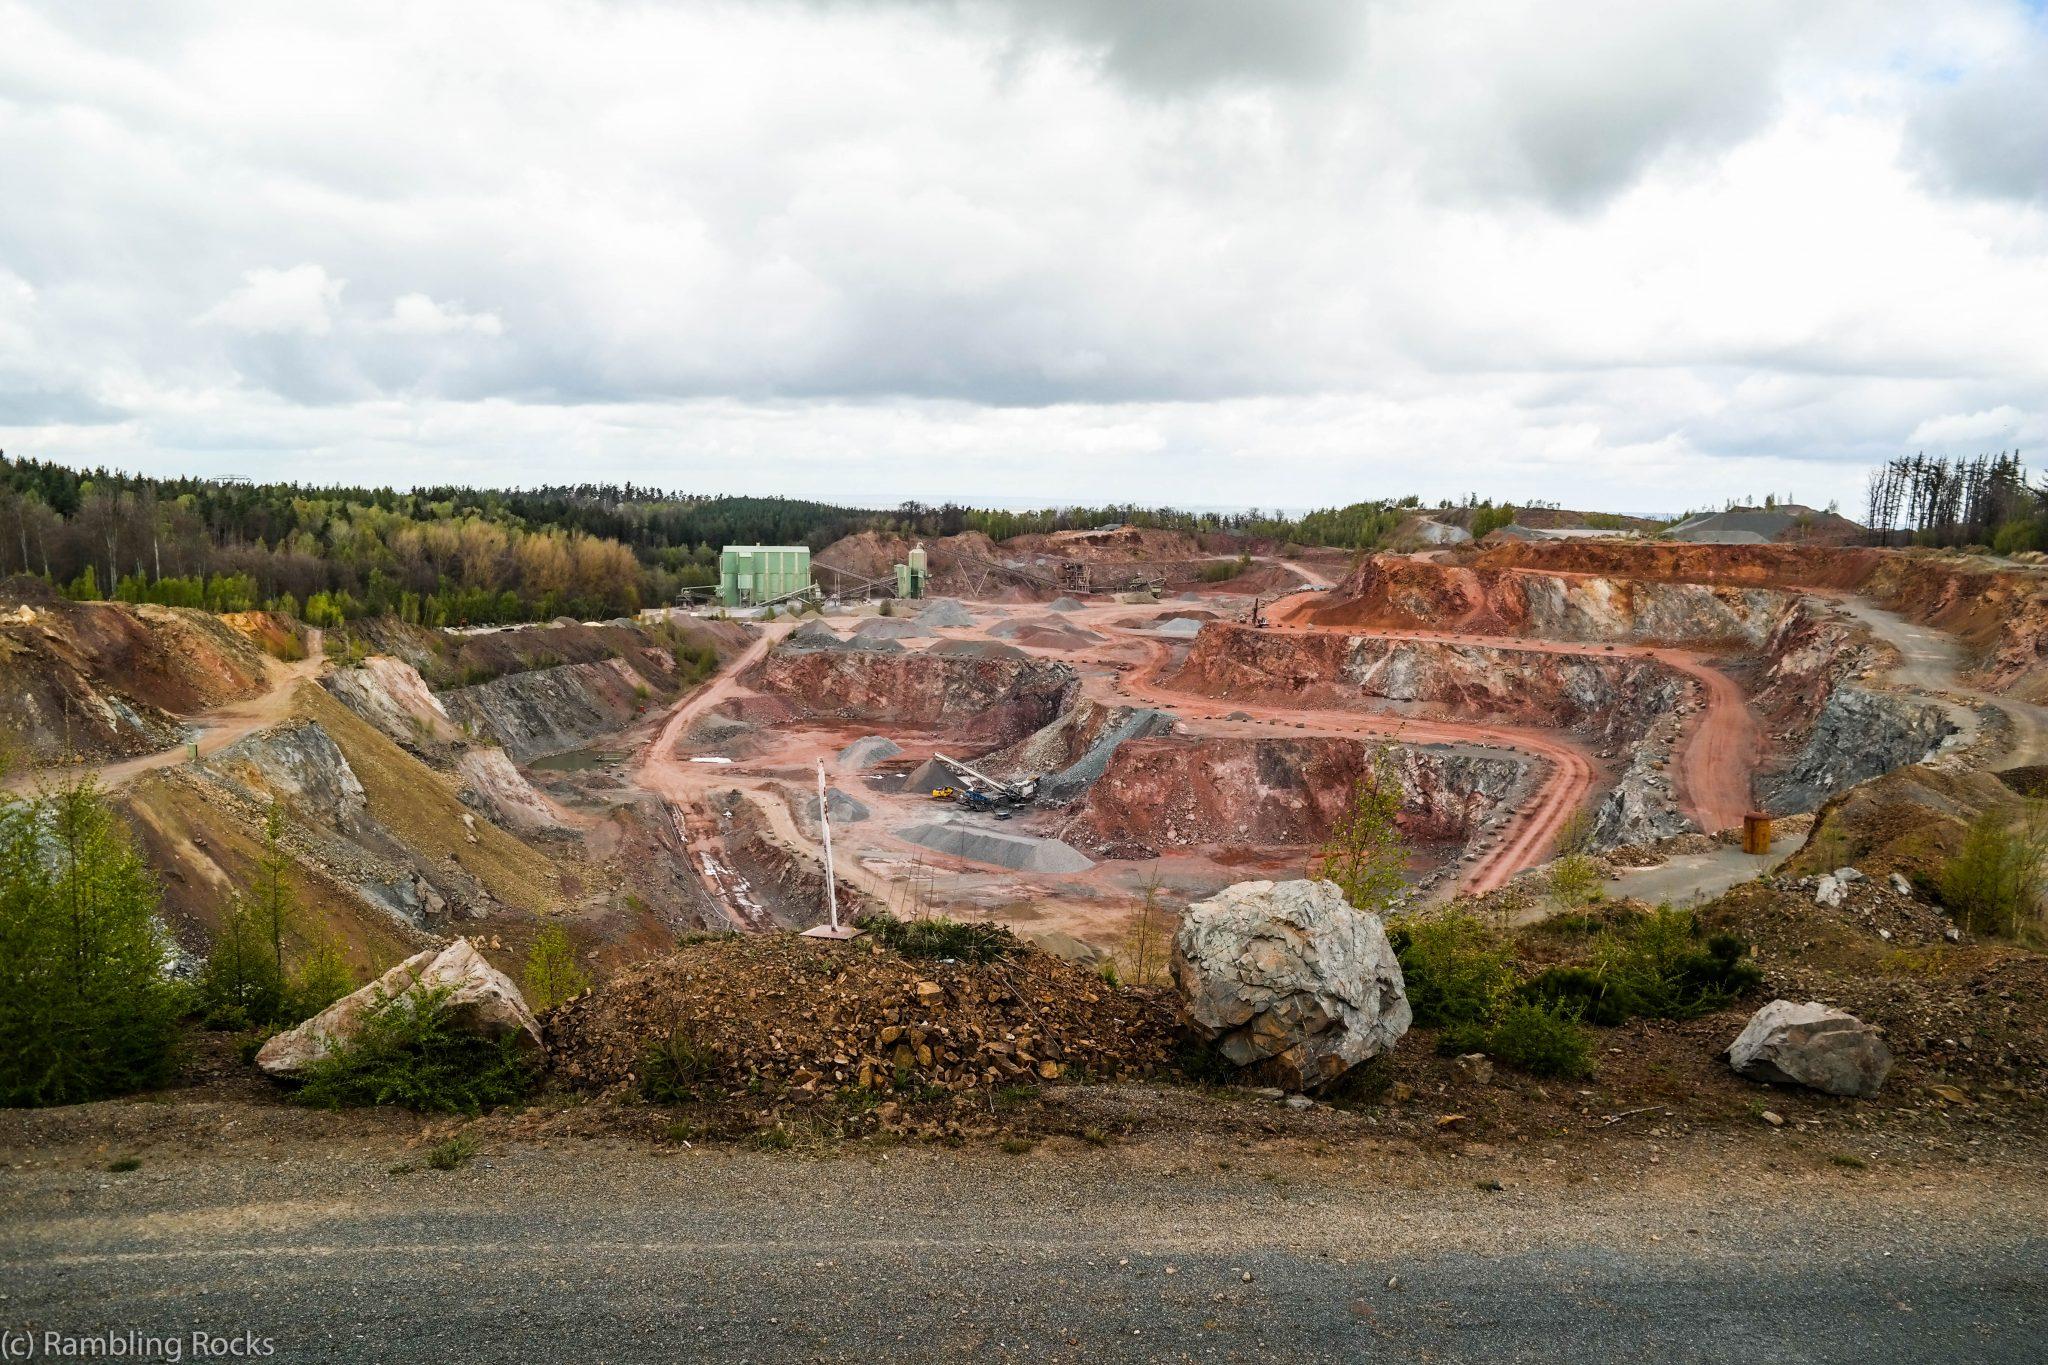 Tagebau Rieder